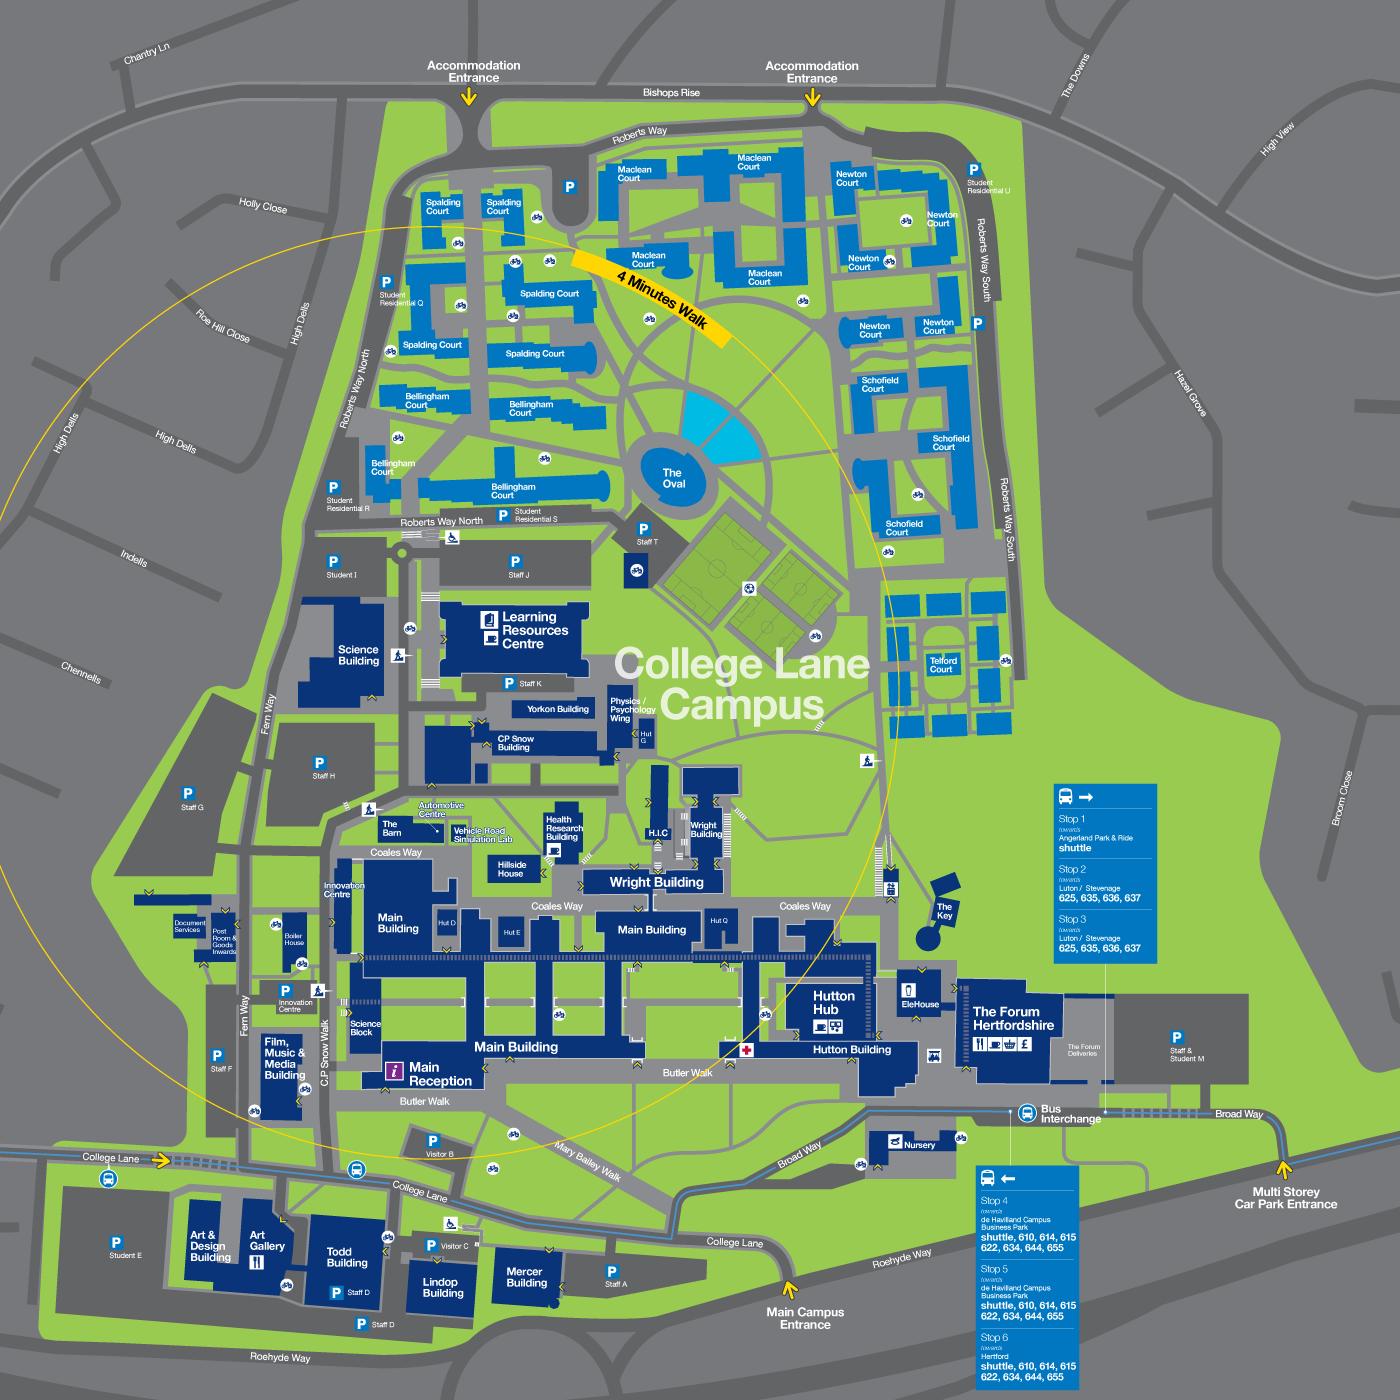 hertfordshire university campus map Fwdesign Wayfinding Amp Design Consultants University Of hertfordshire university campus map